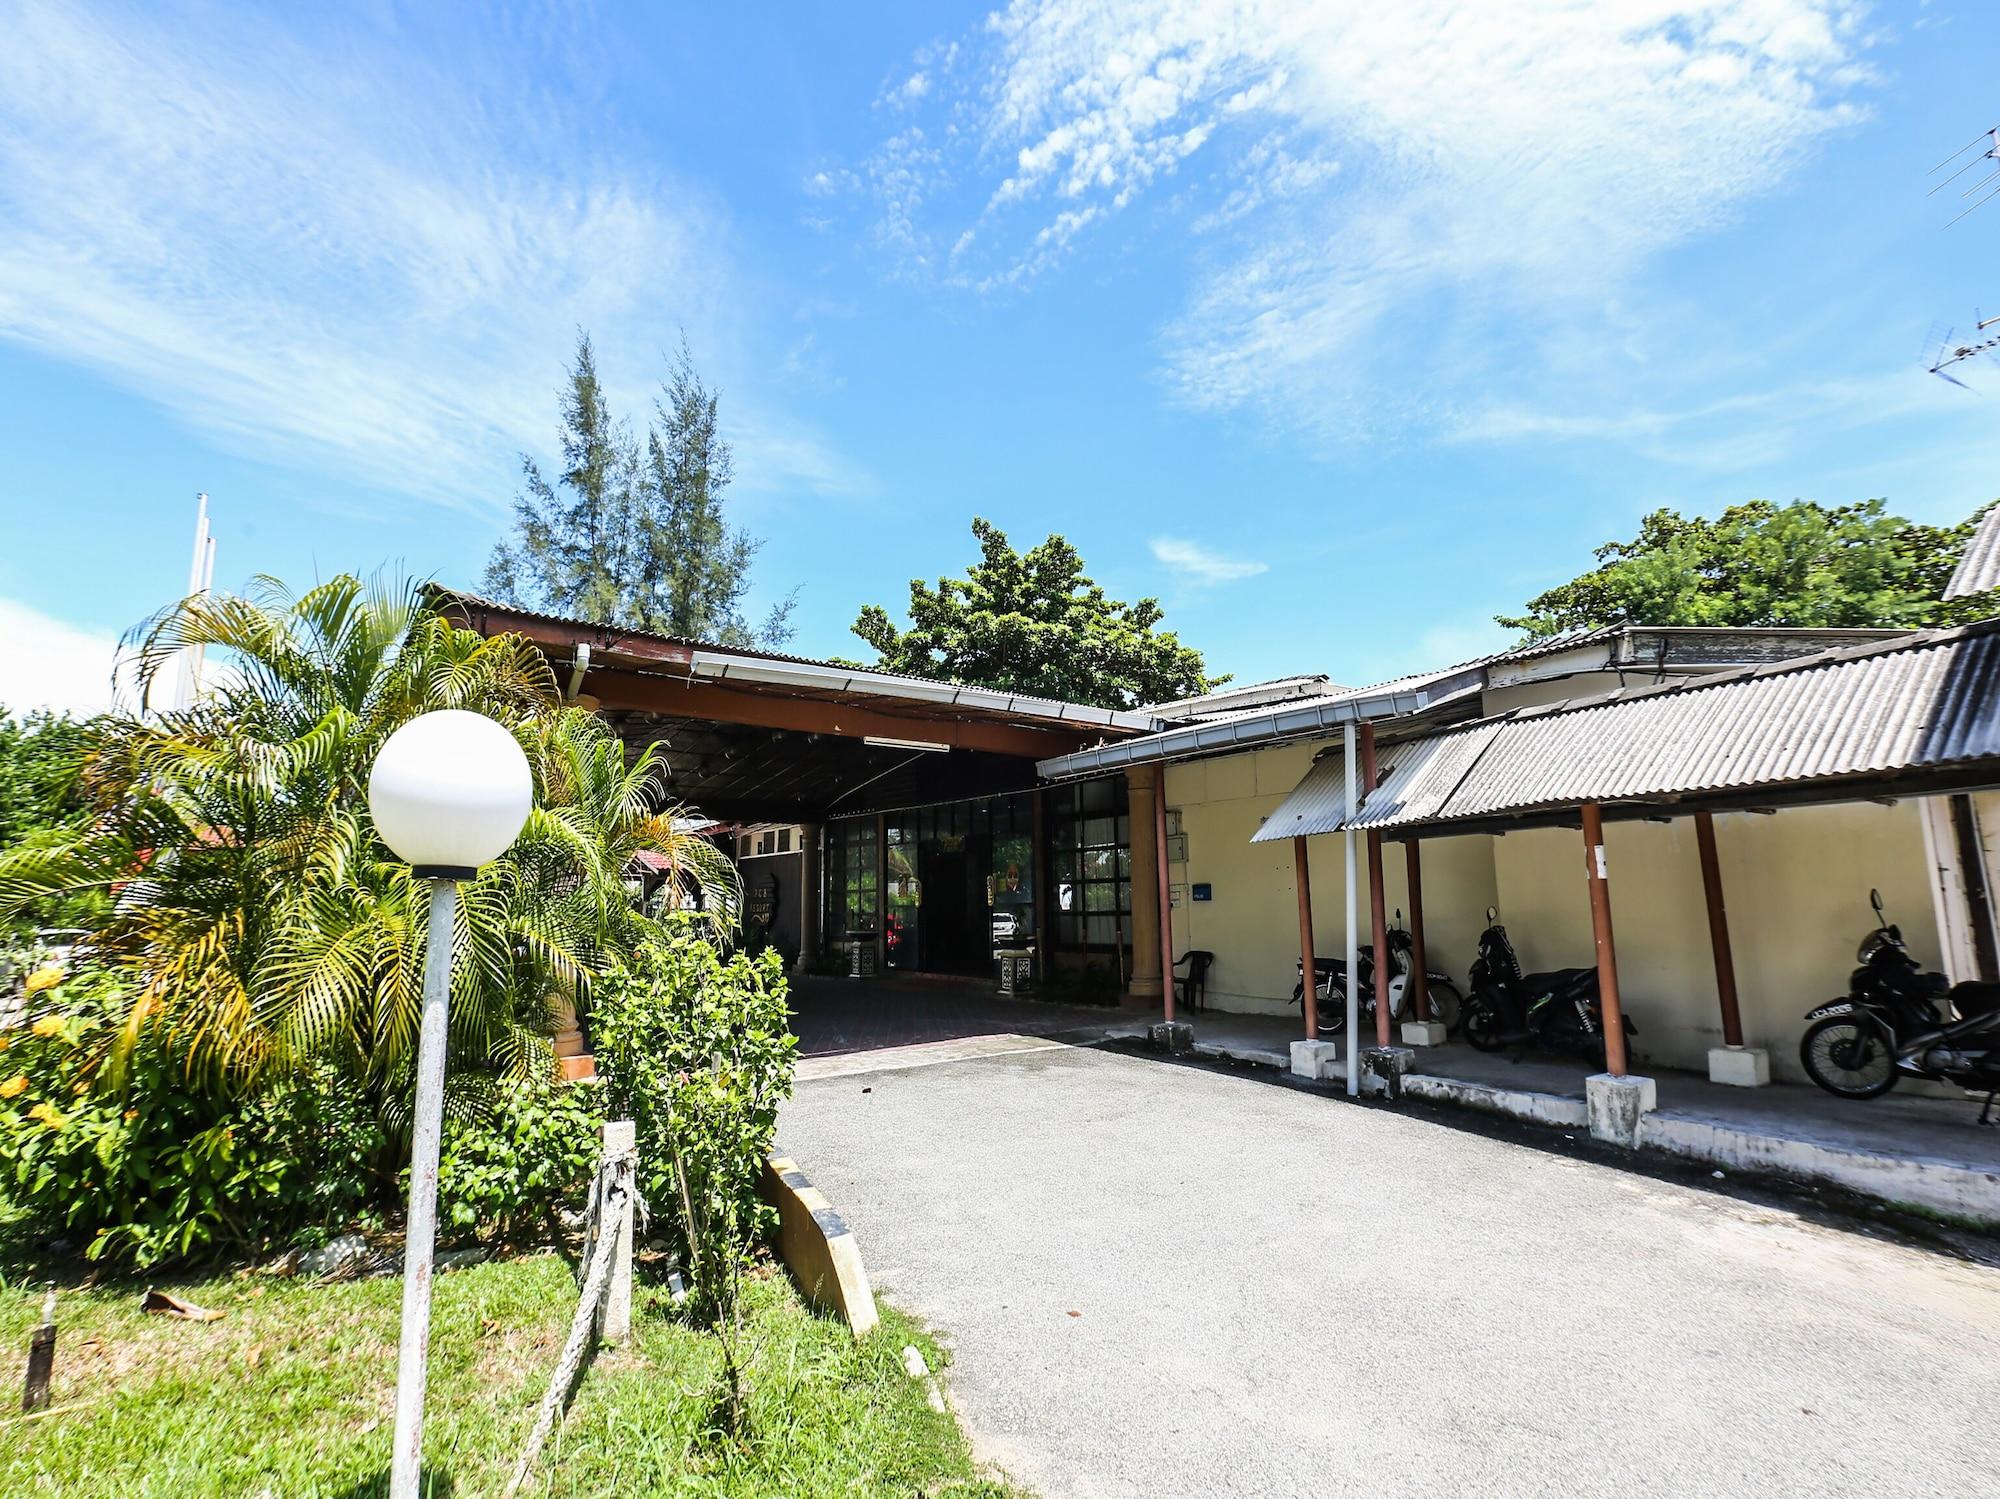 OYO 89488 Pcb Resort, Kota Bharu